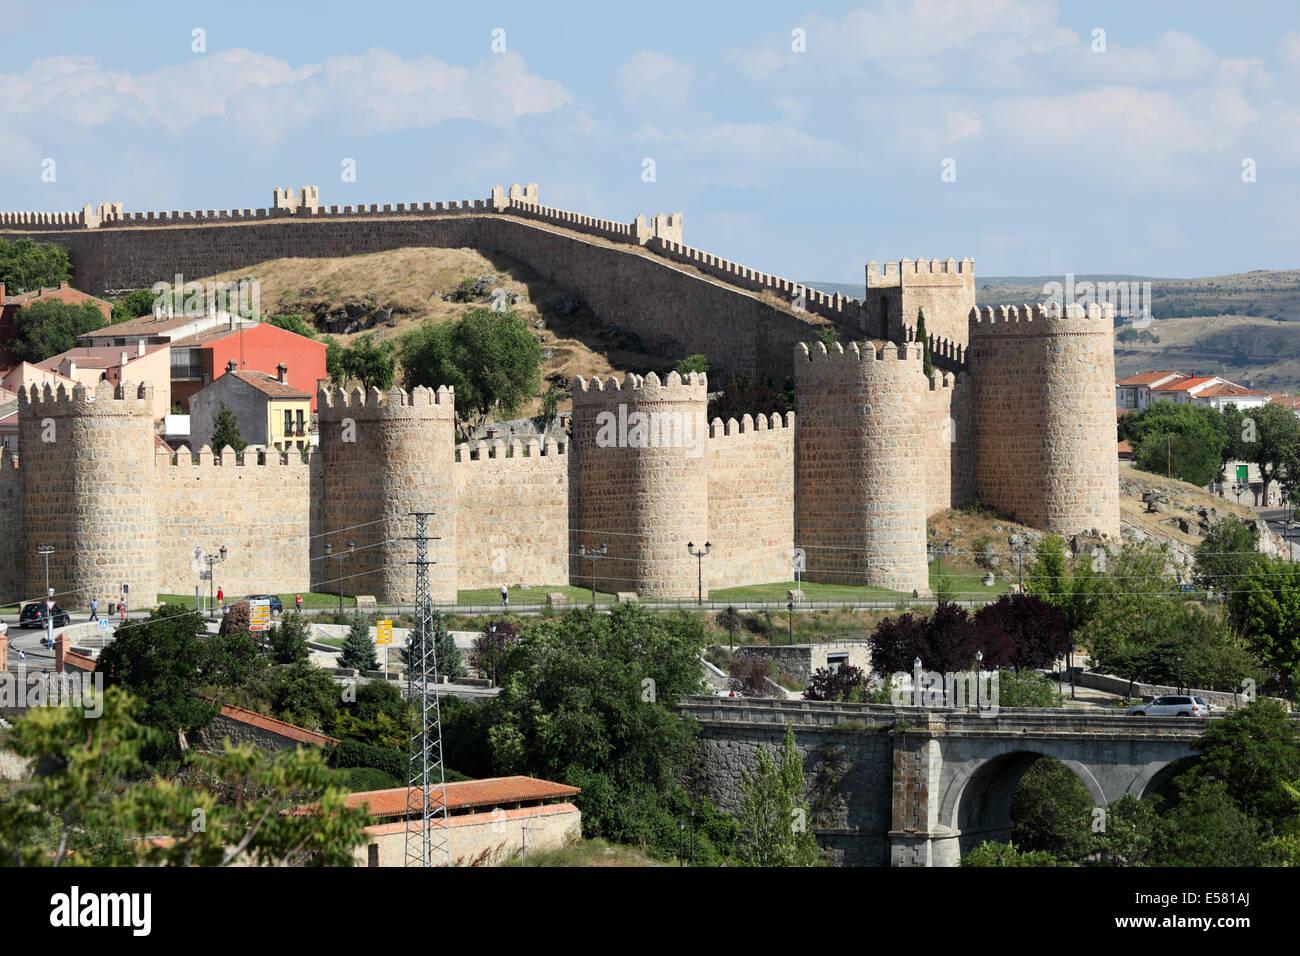 Medieval city walls of Avila, Castilla y Leon, Spain - Stock Image